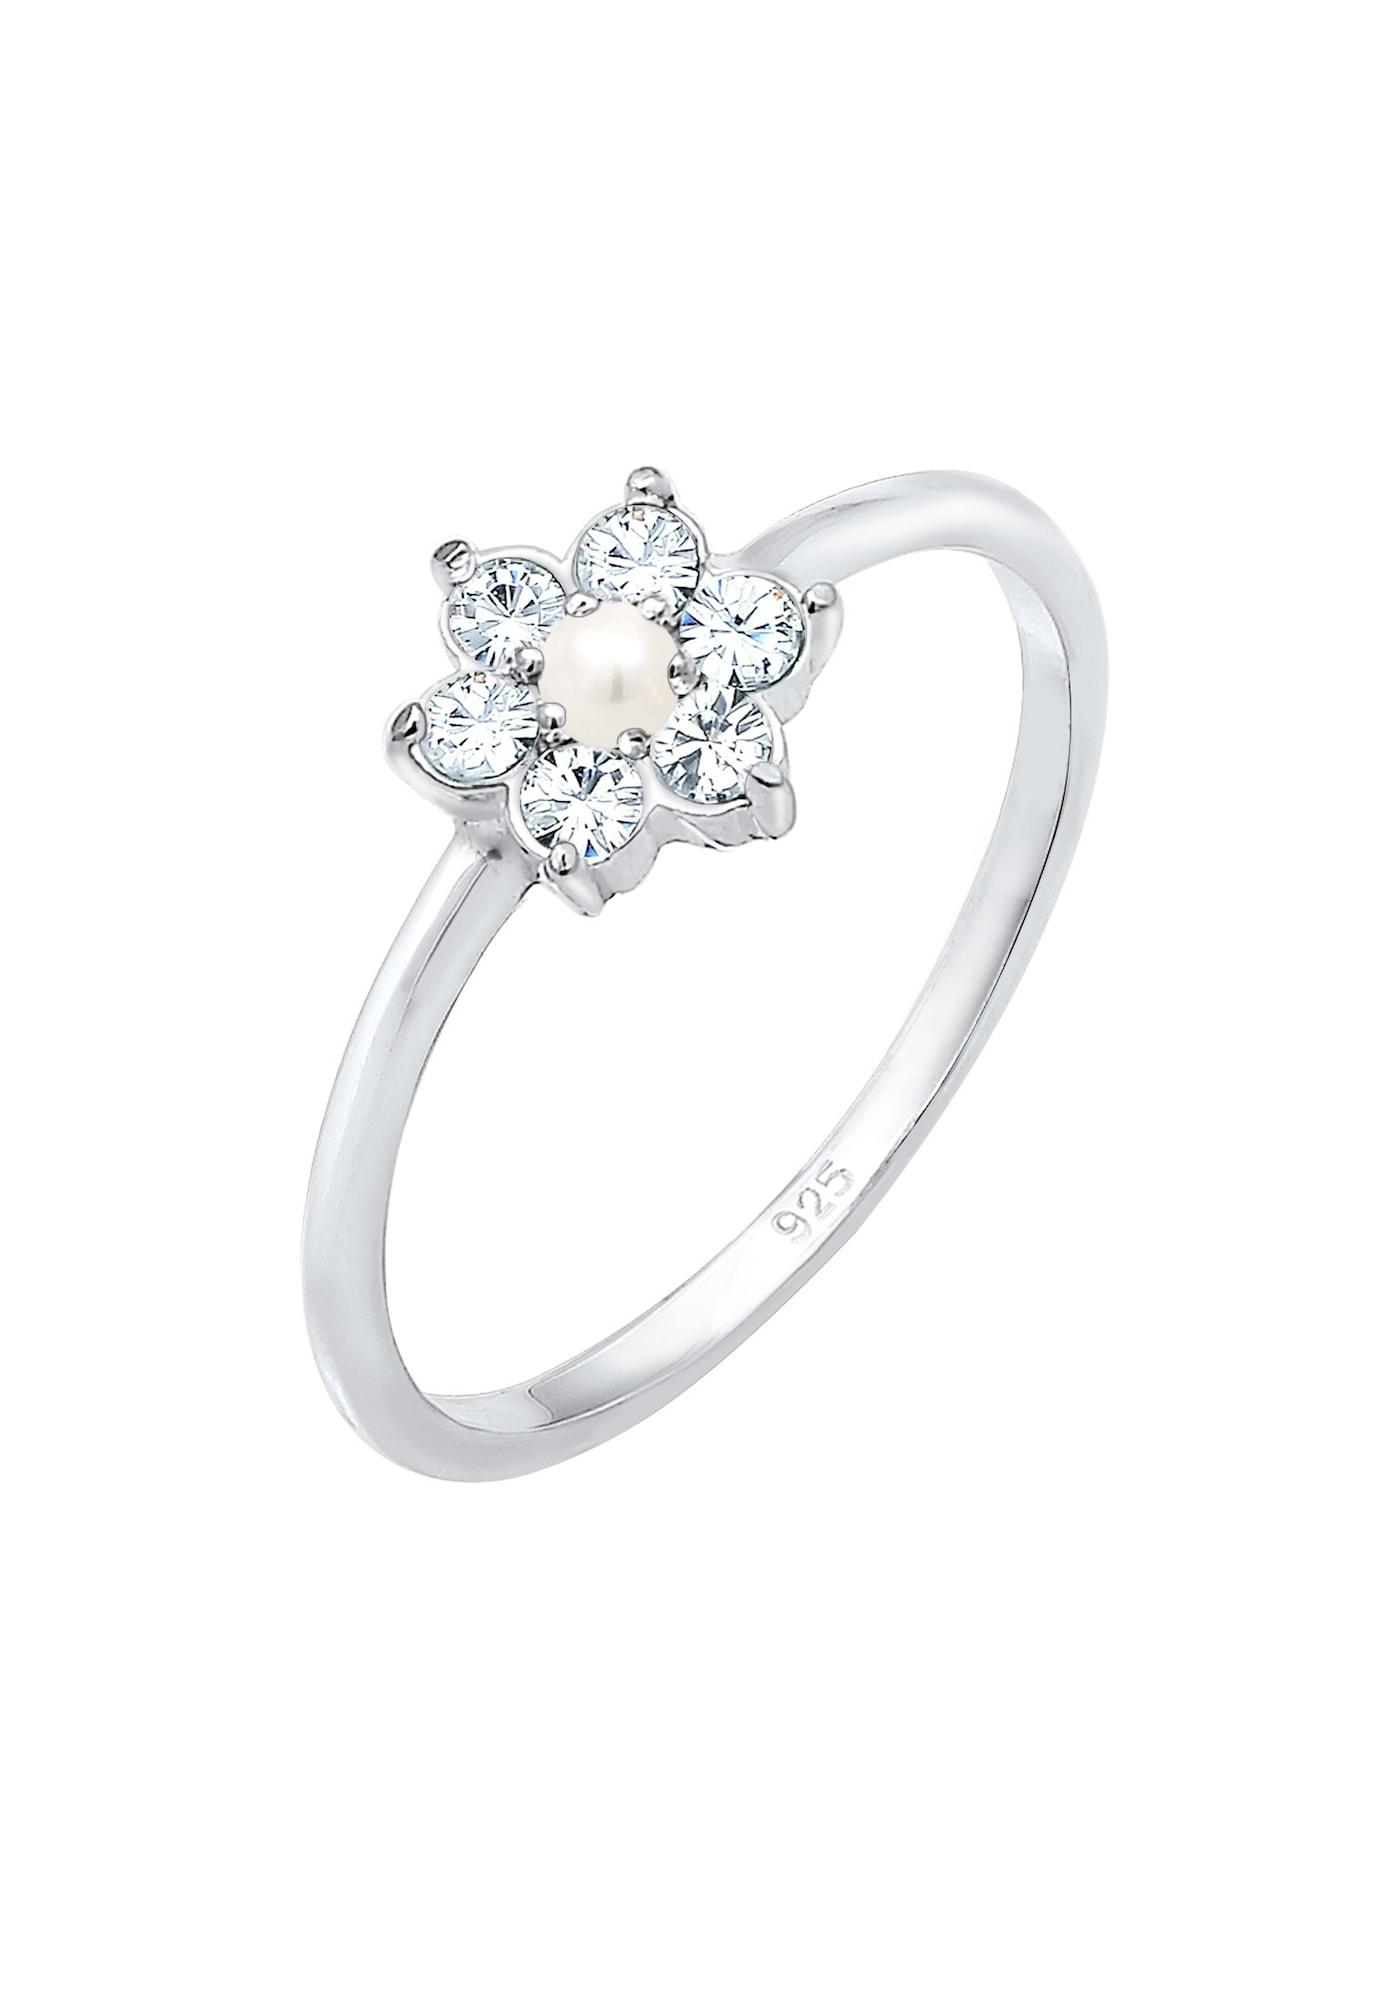 Verlobungsring 'Blume' | Schmuck > Ringe > Verlobungsringe | Silber | ELLI PREMIUM